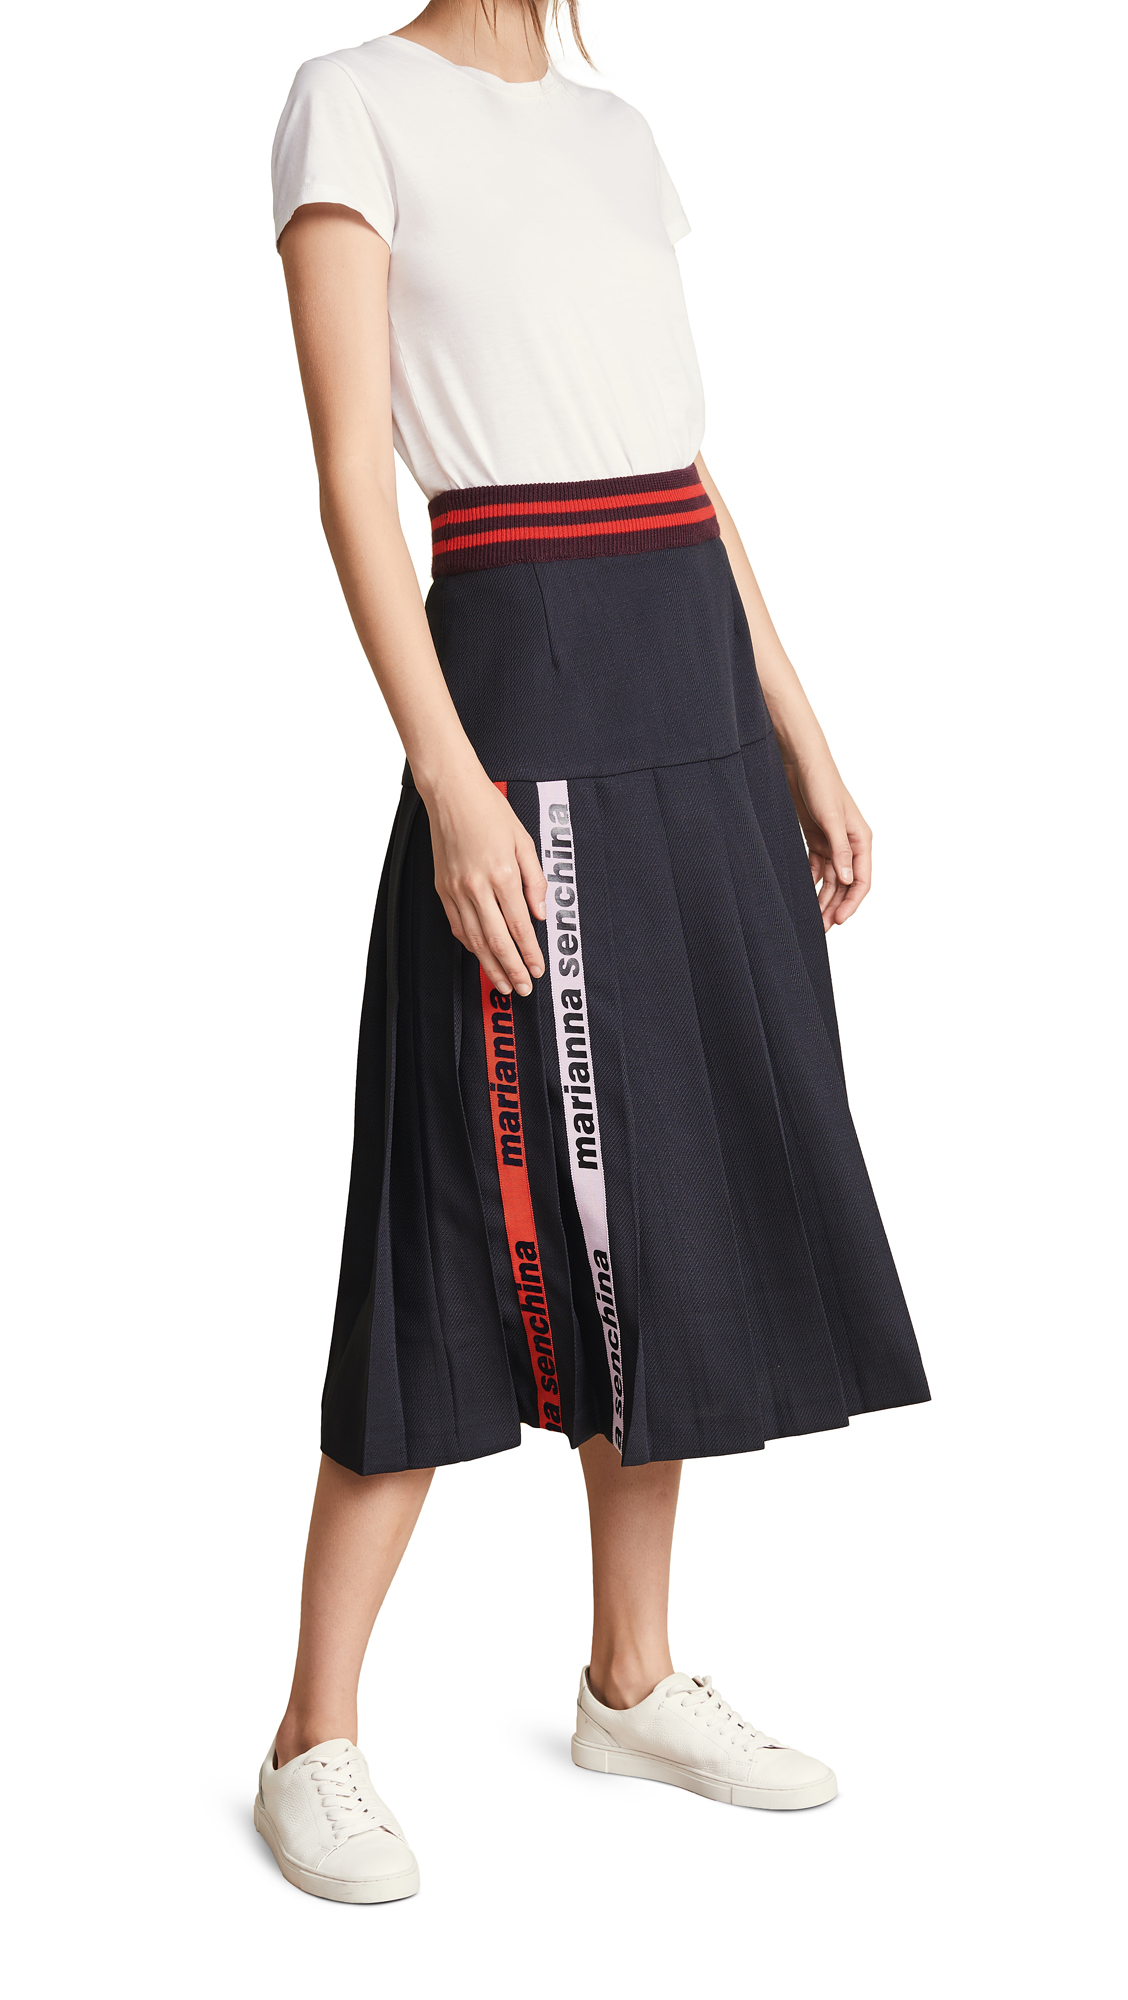 MARIANNA SENCHINA Pleated Skirt in Dark Blue